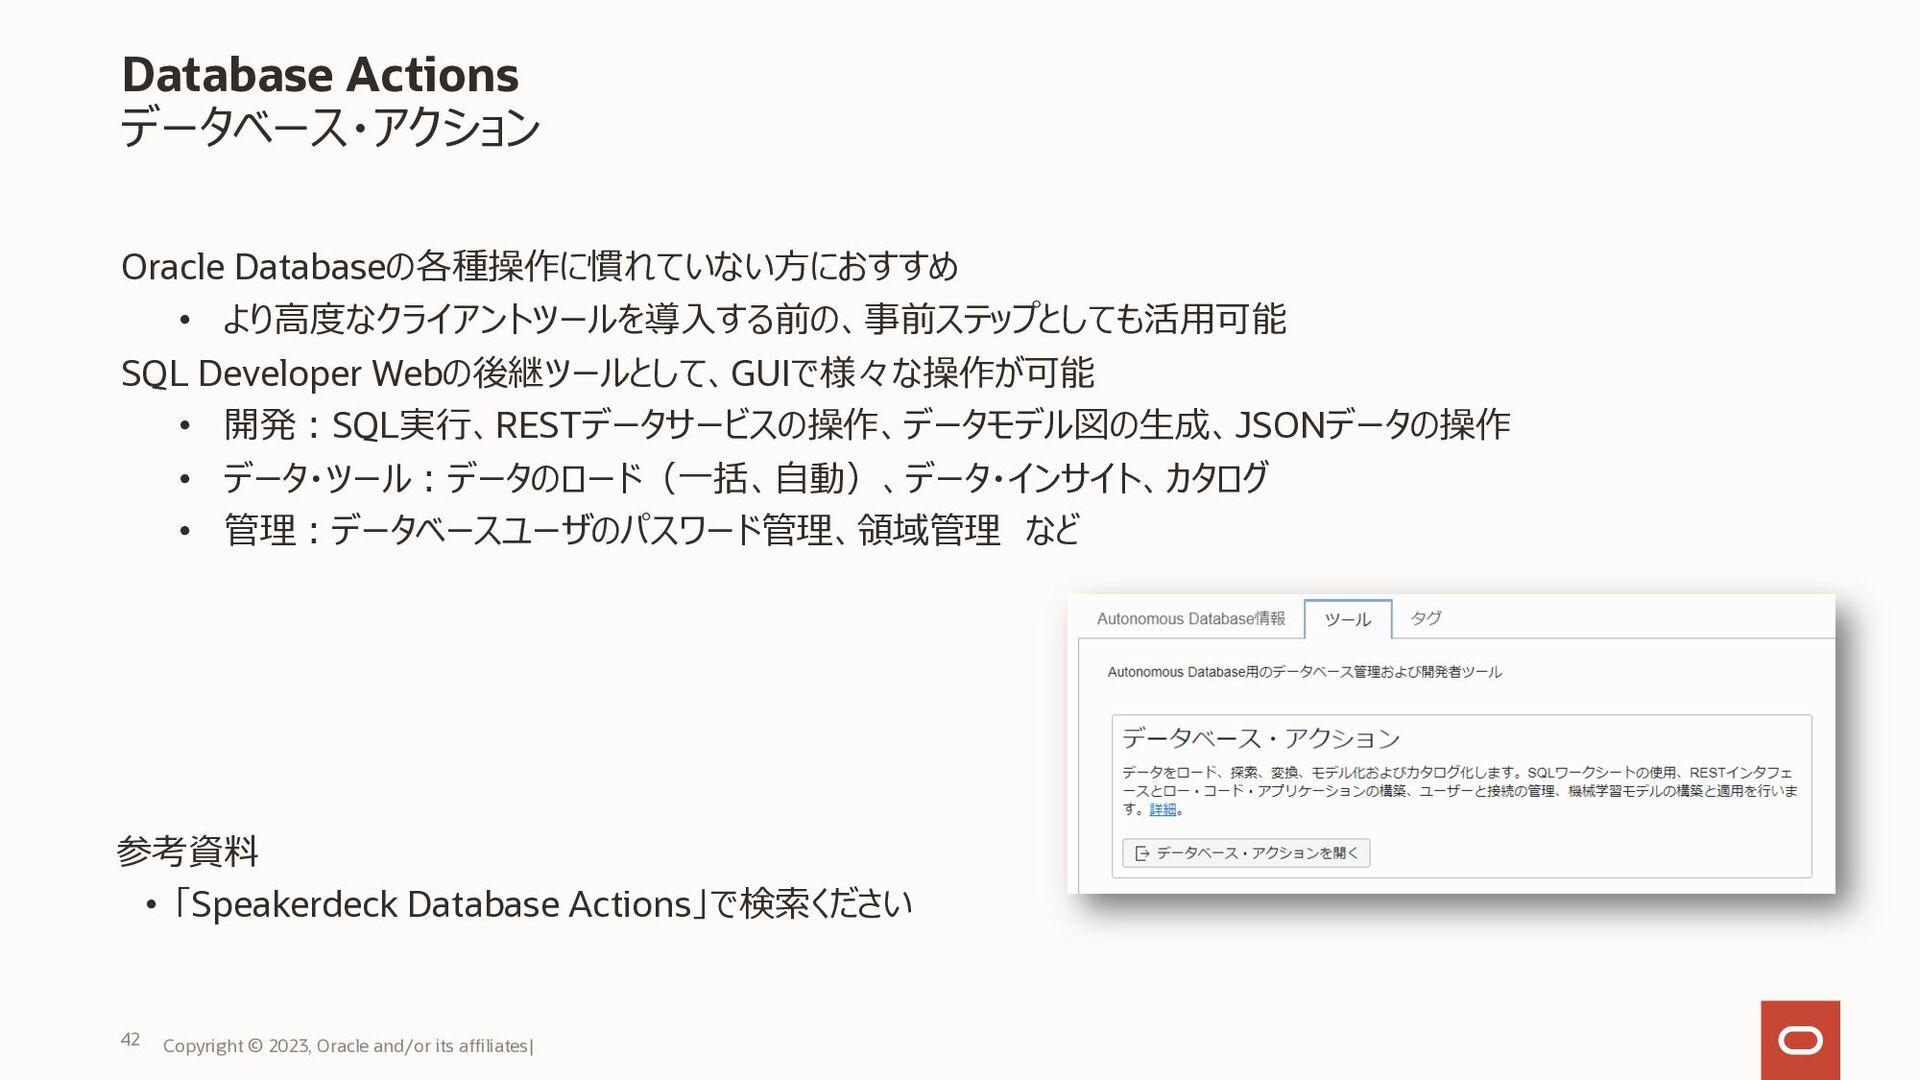 SQL*Plus(OCI)での接続イメージ 接続情報を編集し、インスタンスに接続 Copyri...